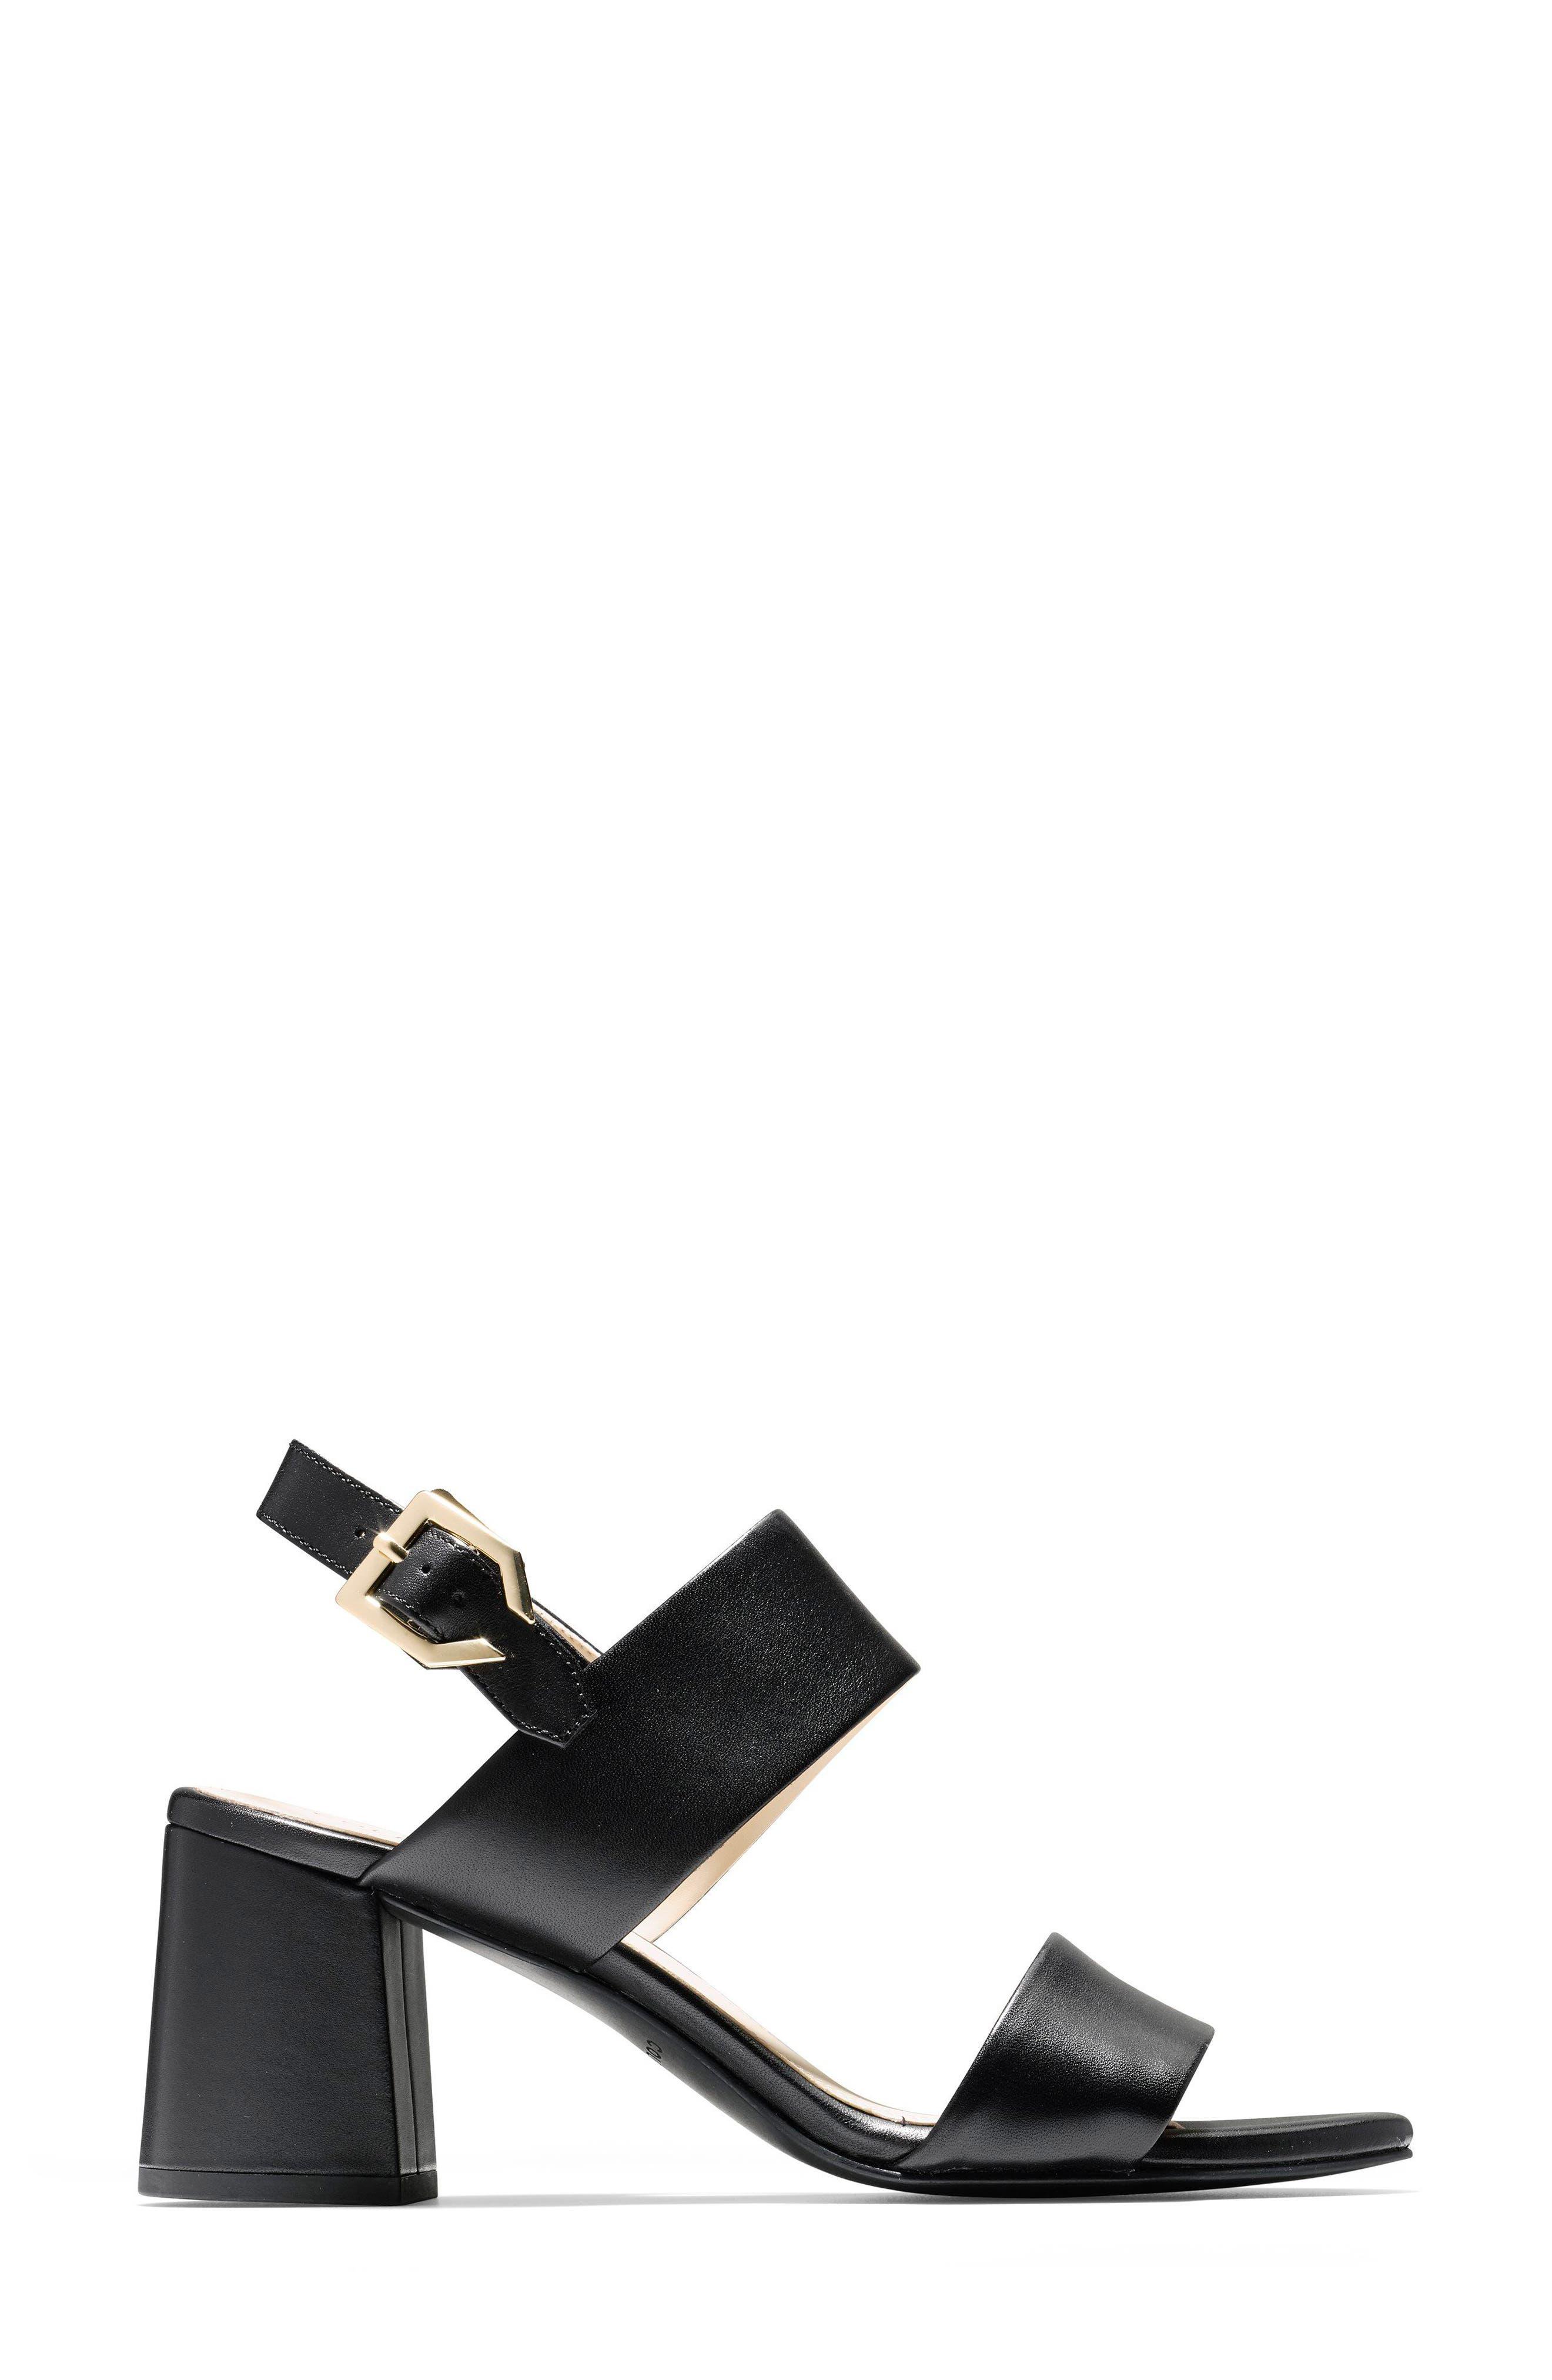 Avani Block Heel Sandal,                             Alternate thumbnail 3, color,                             Black Leather